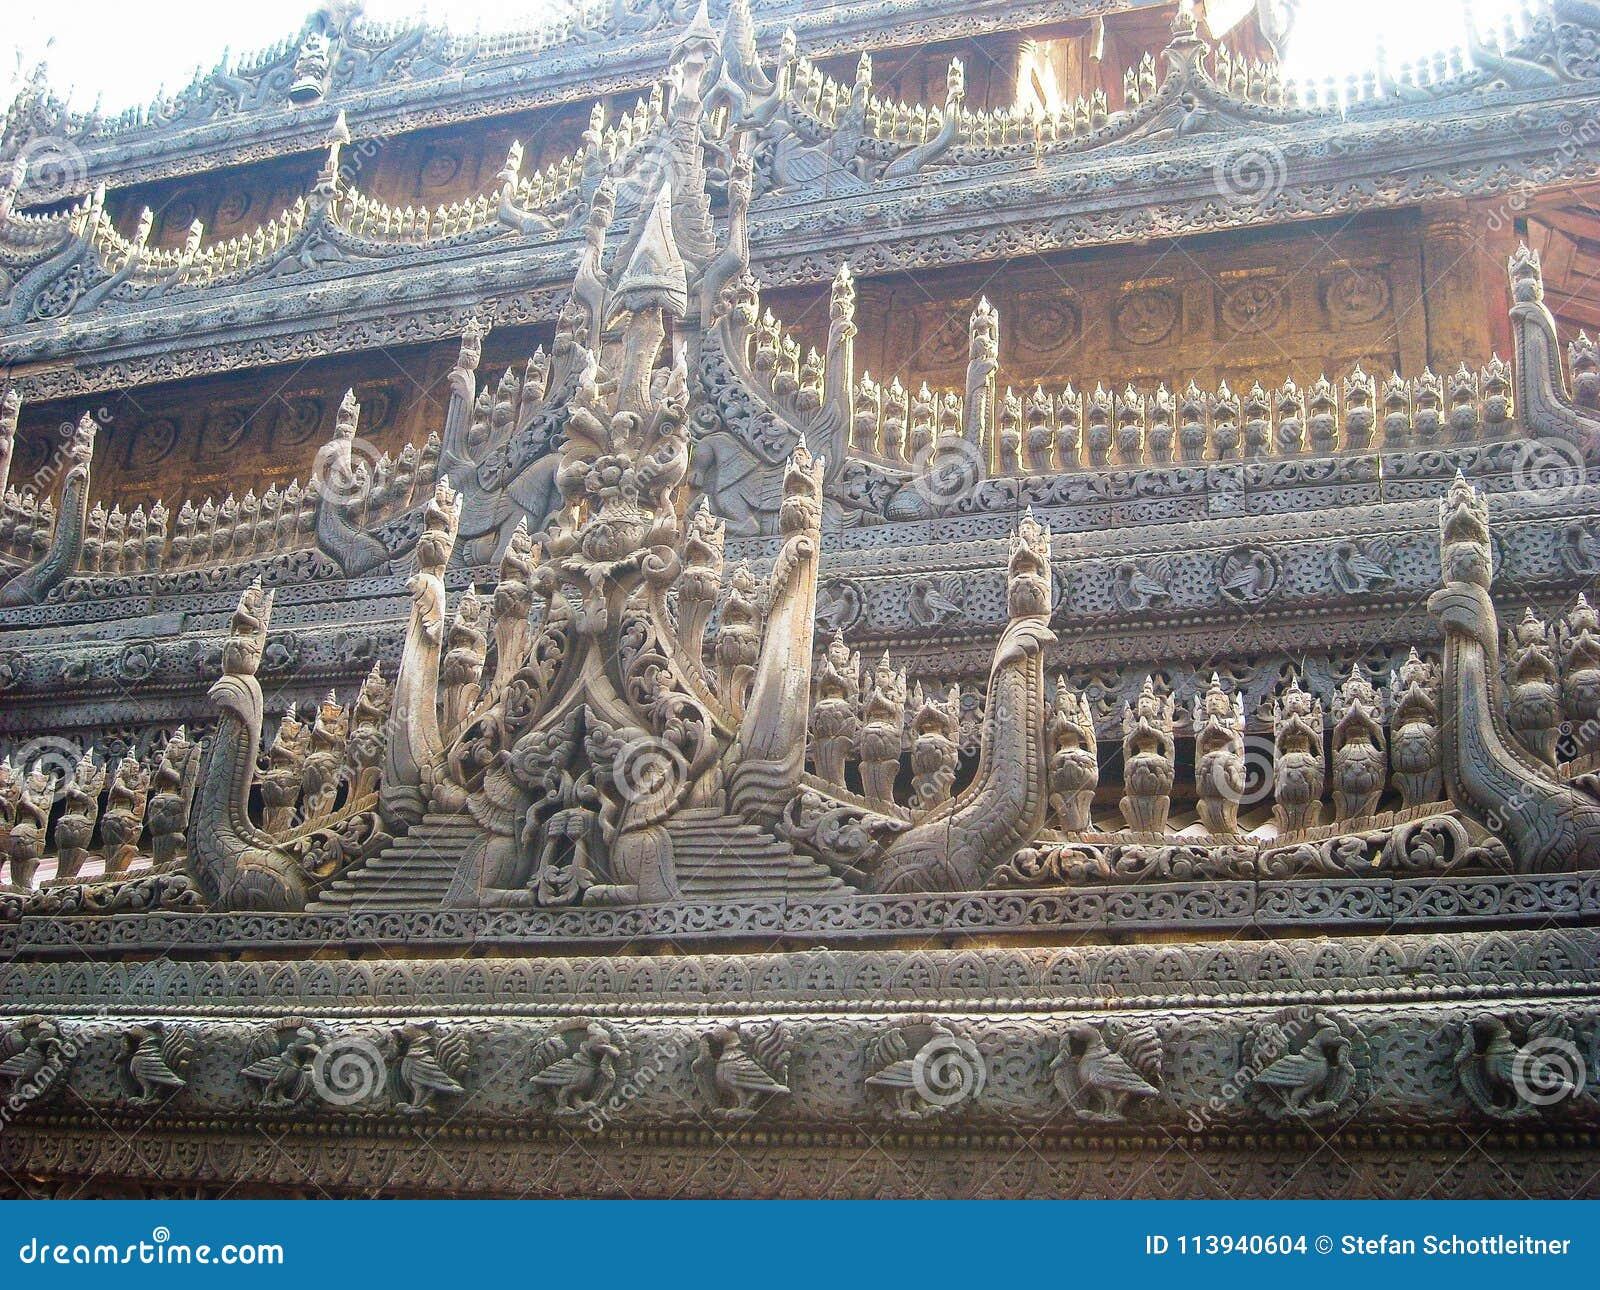 A temple in burma